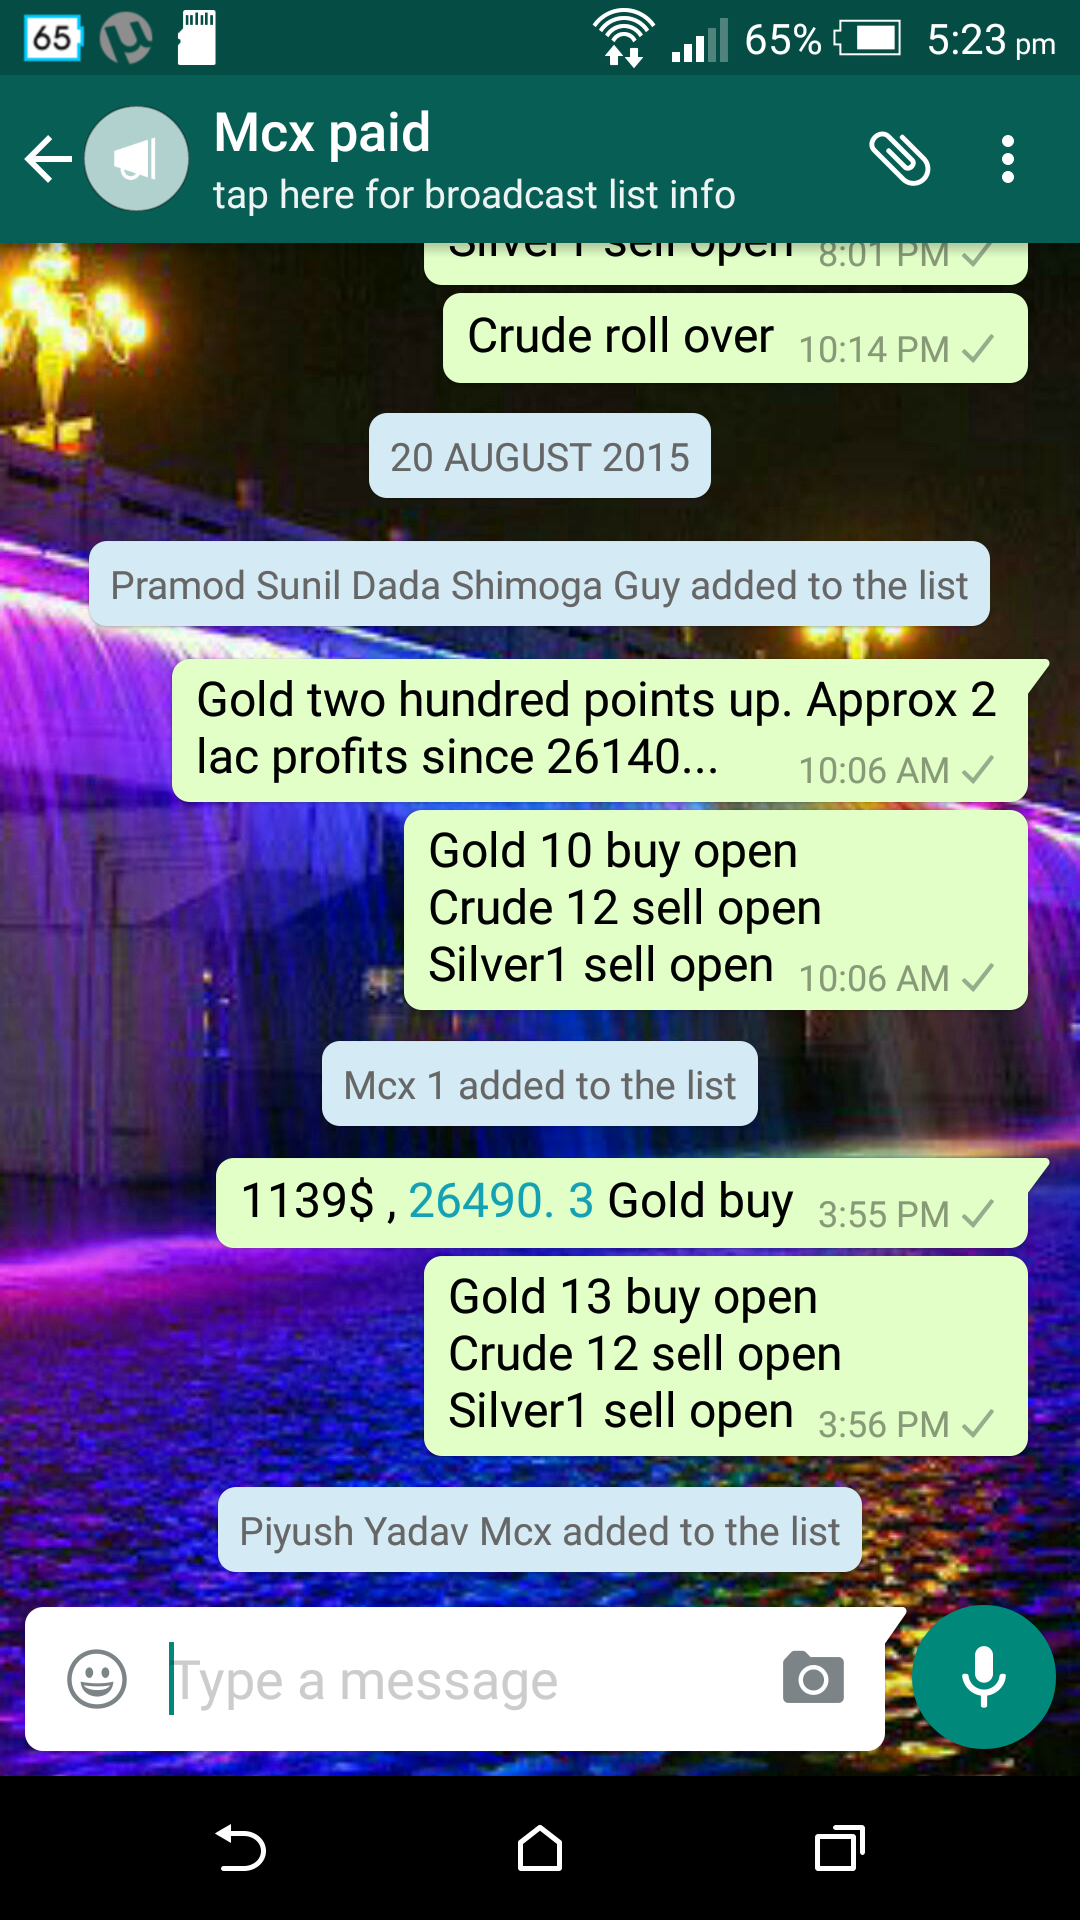 screenshot_2015-08-20-17-23-09.png